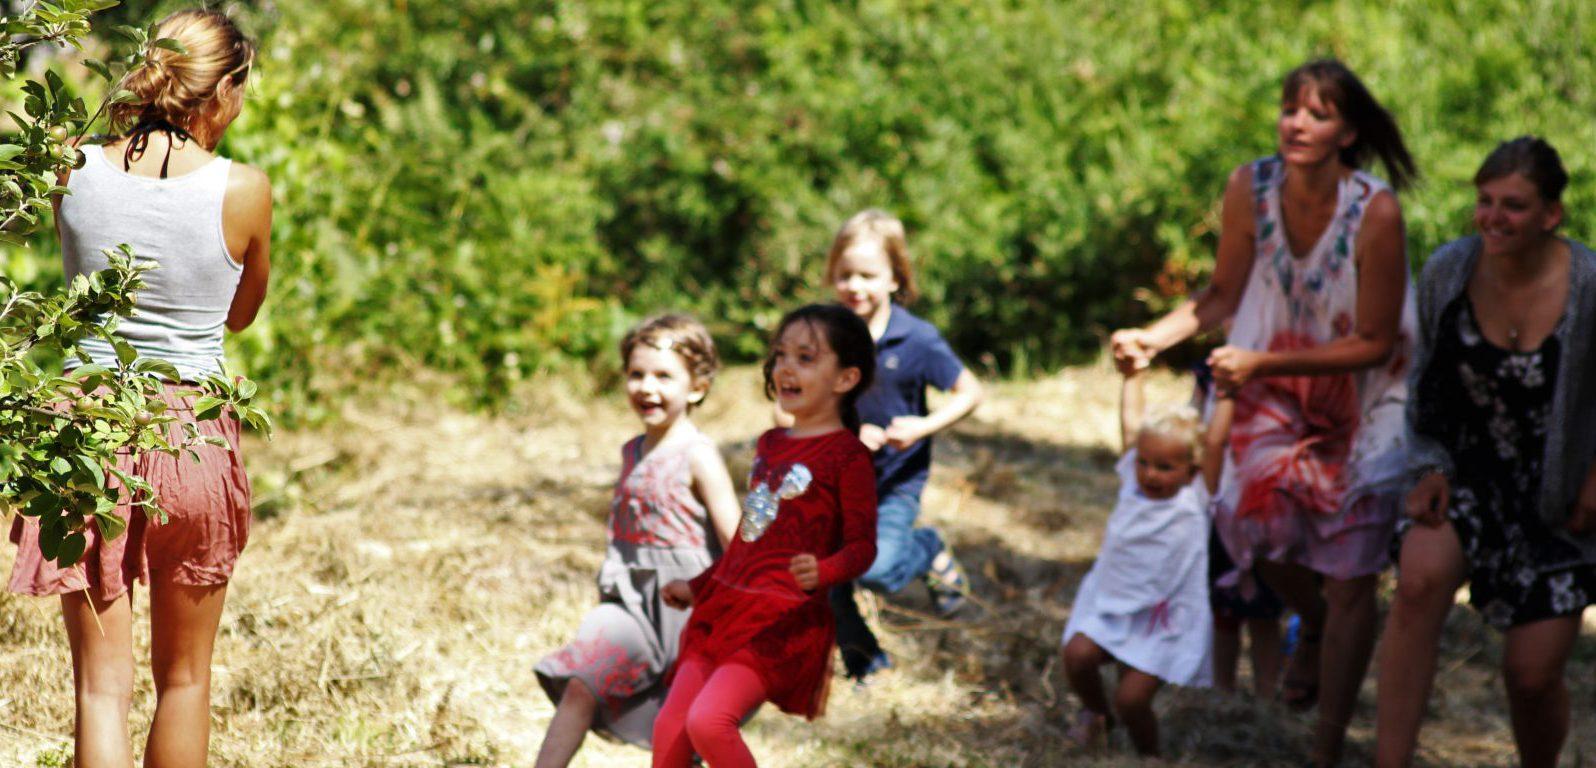 Fun in portugal - family and kids club - quinta Algarve